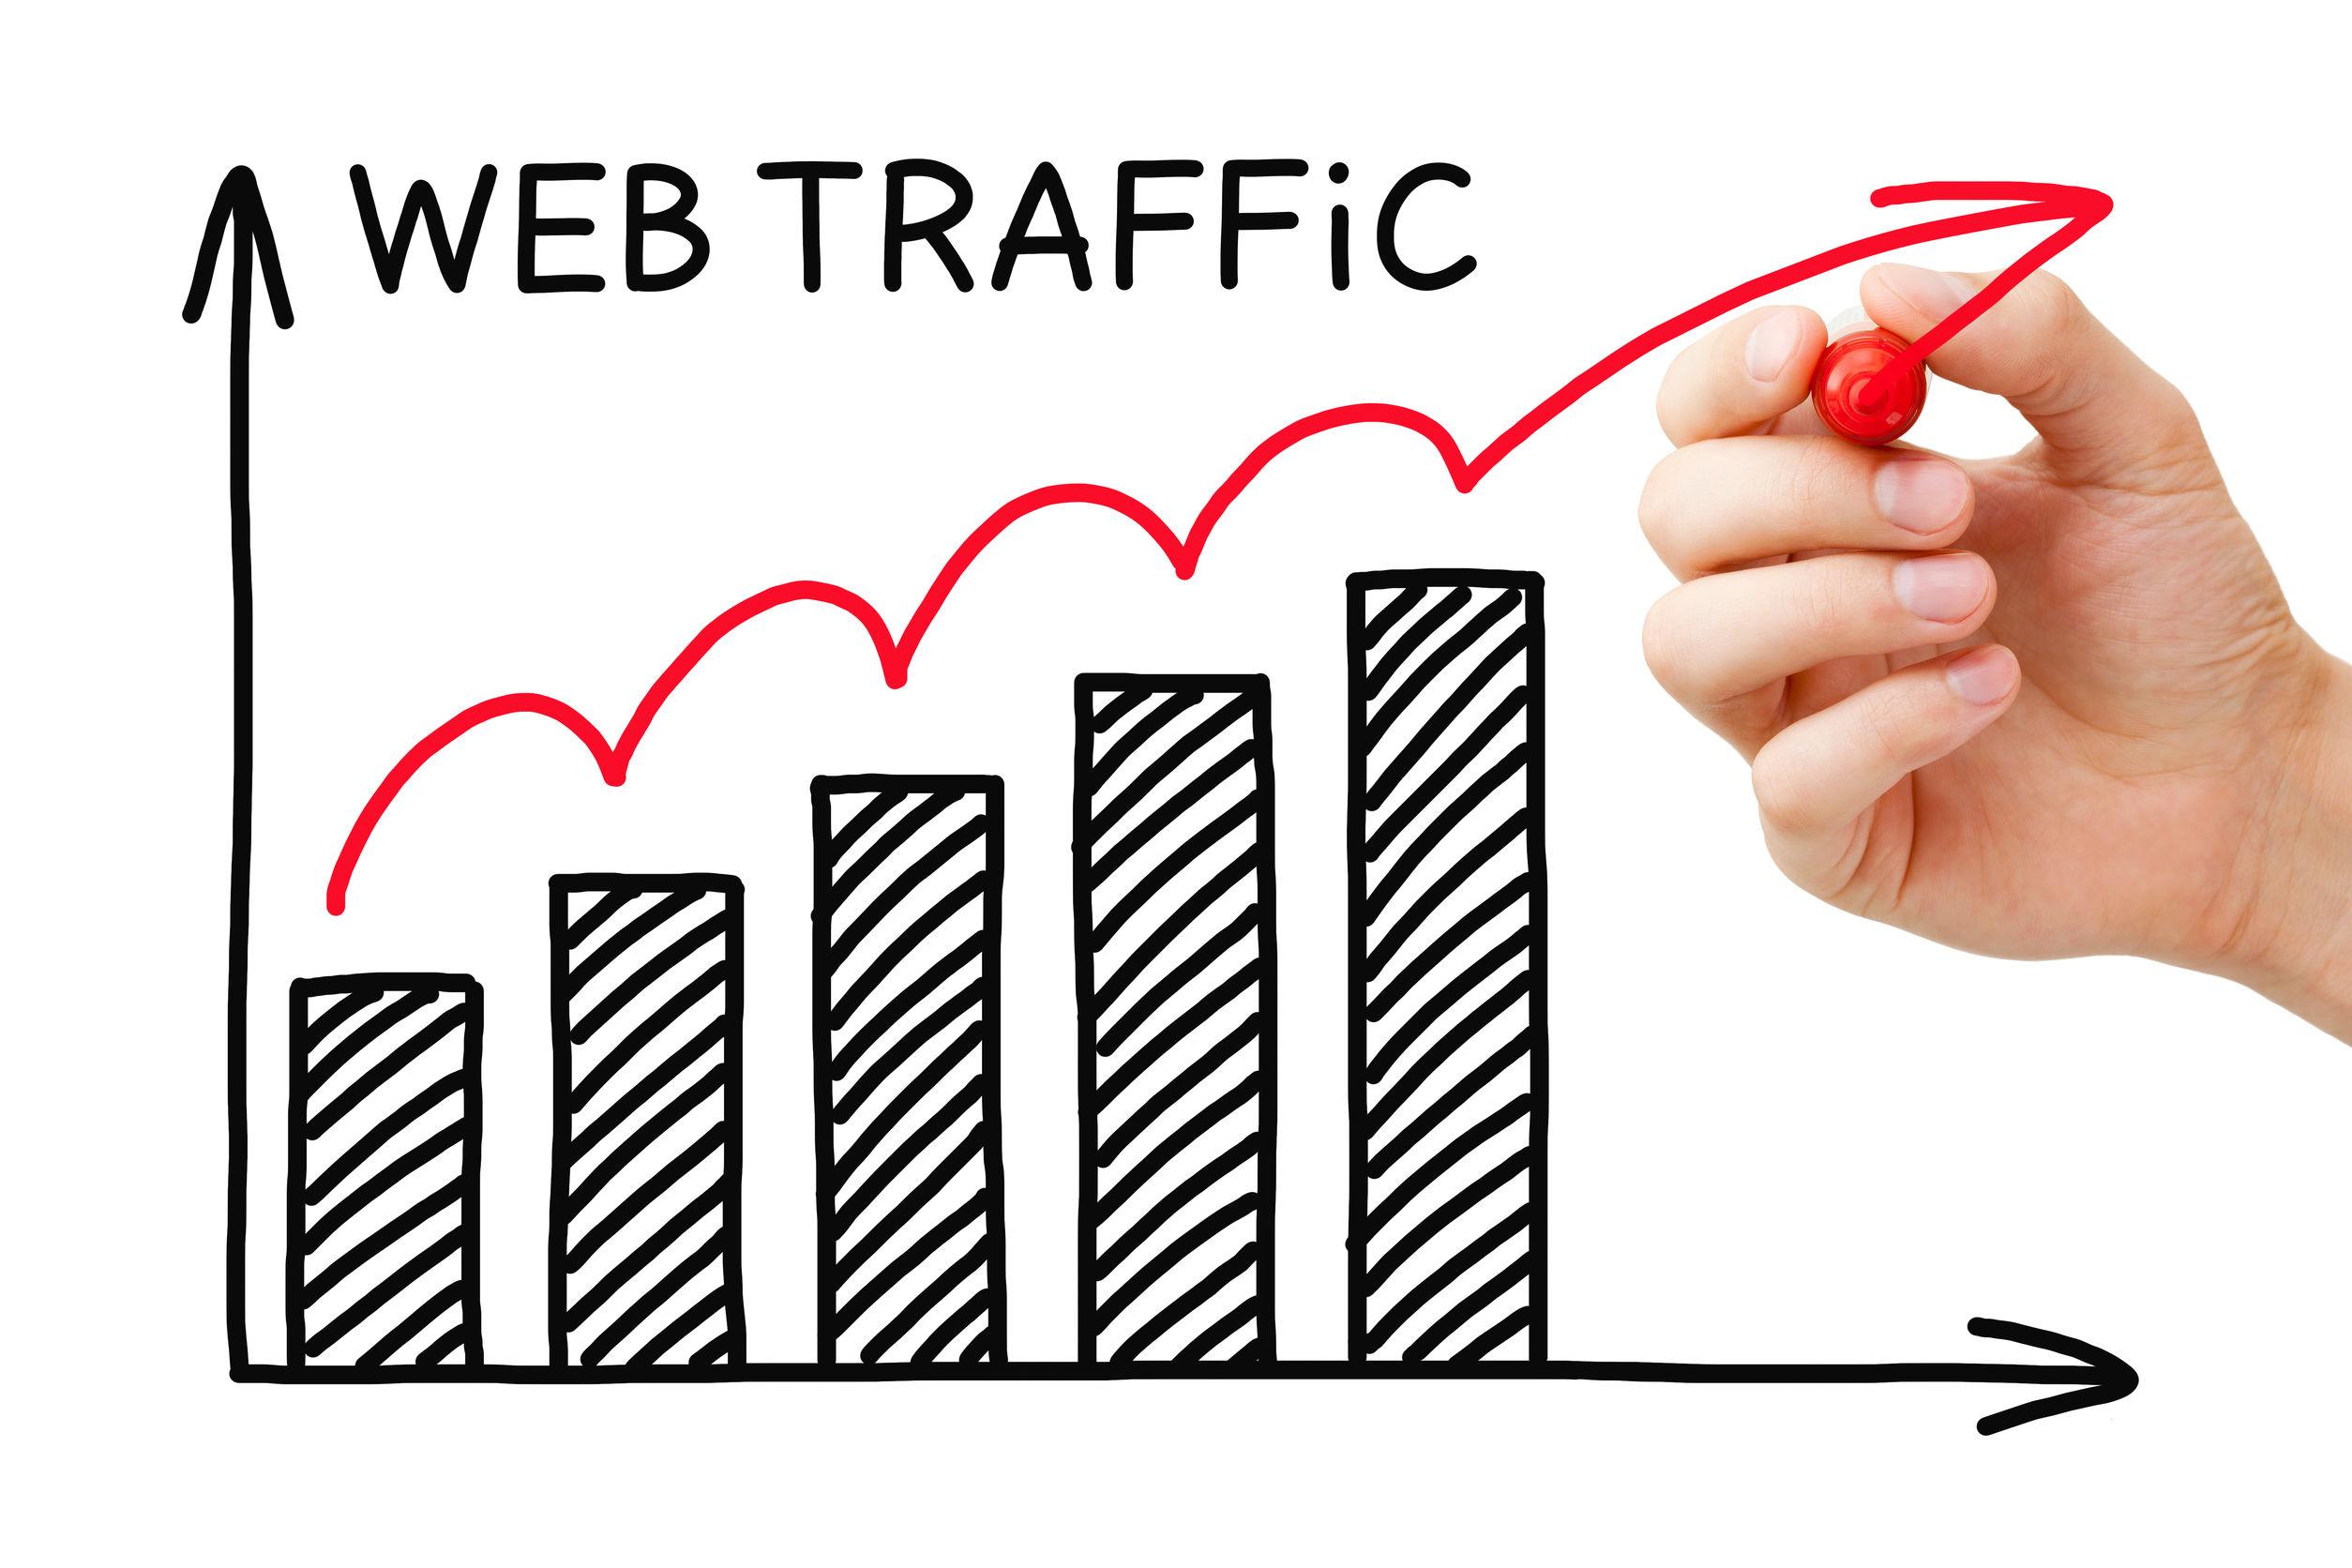 increase-website-traffic-sonority-group.jpeg